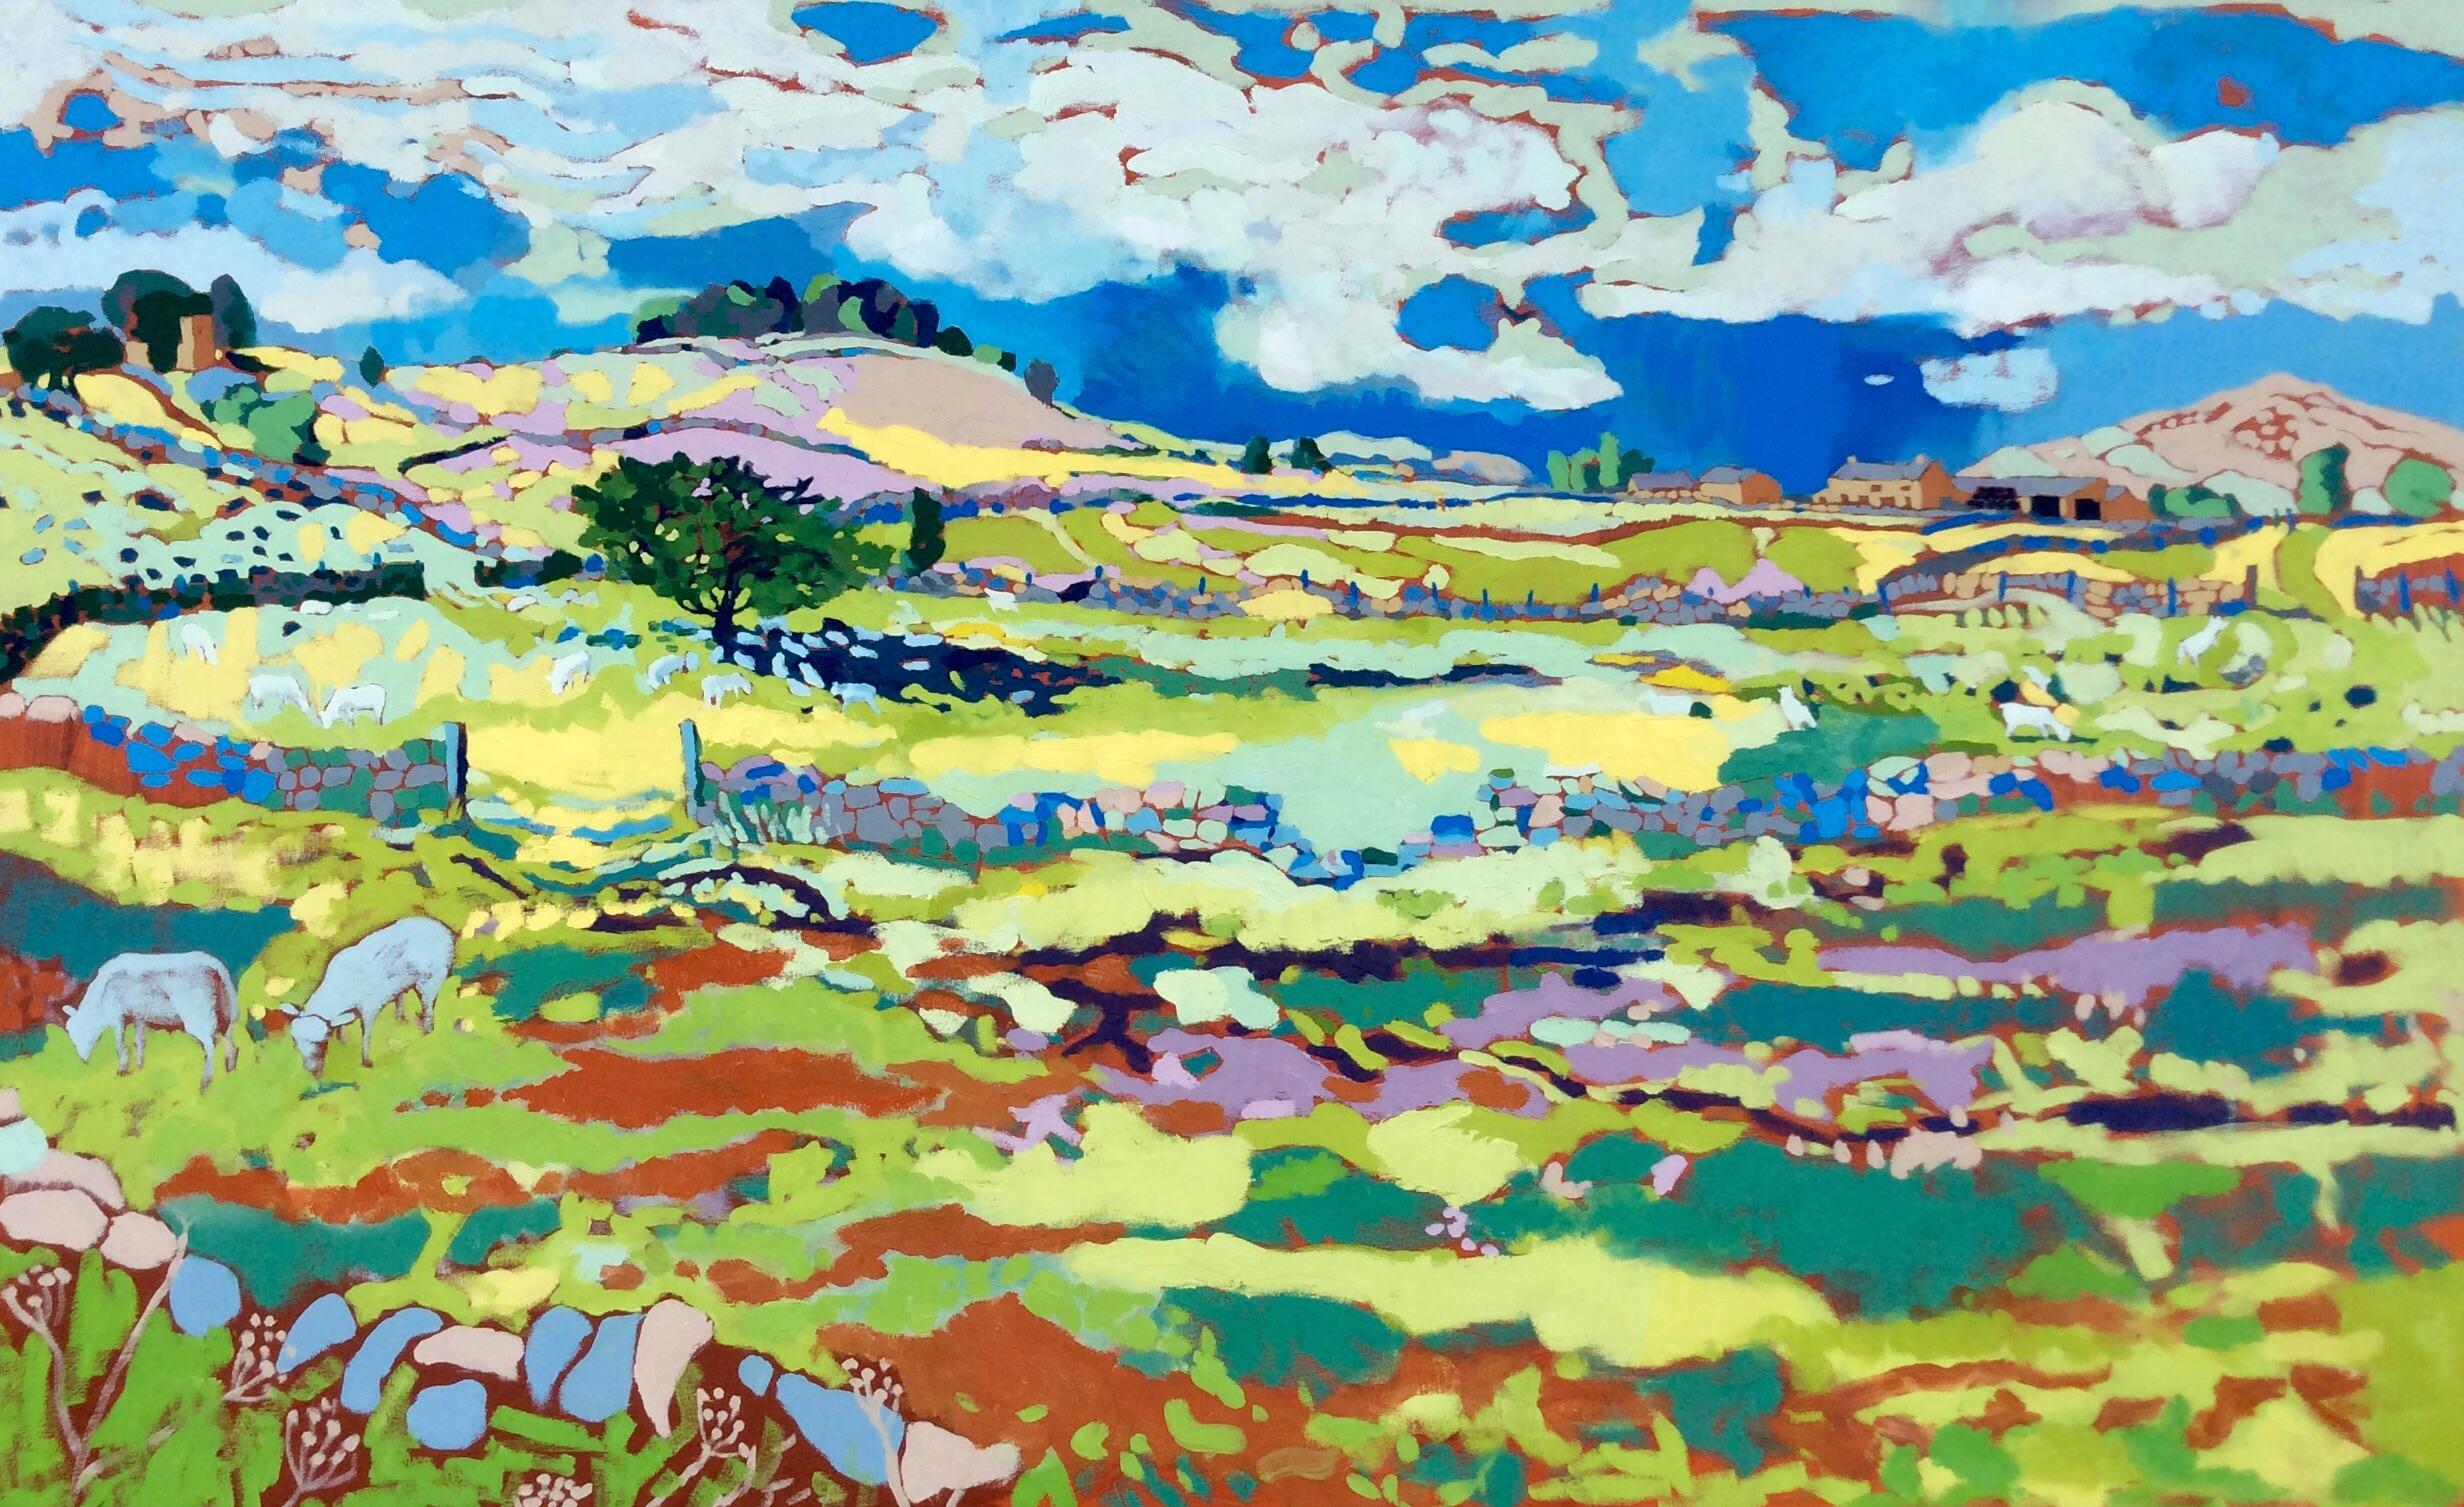 Shining Summer Fields, Alstonefield. Oil on canvas. 100 x 161 cm